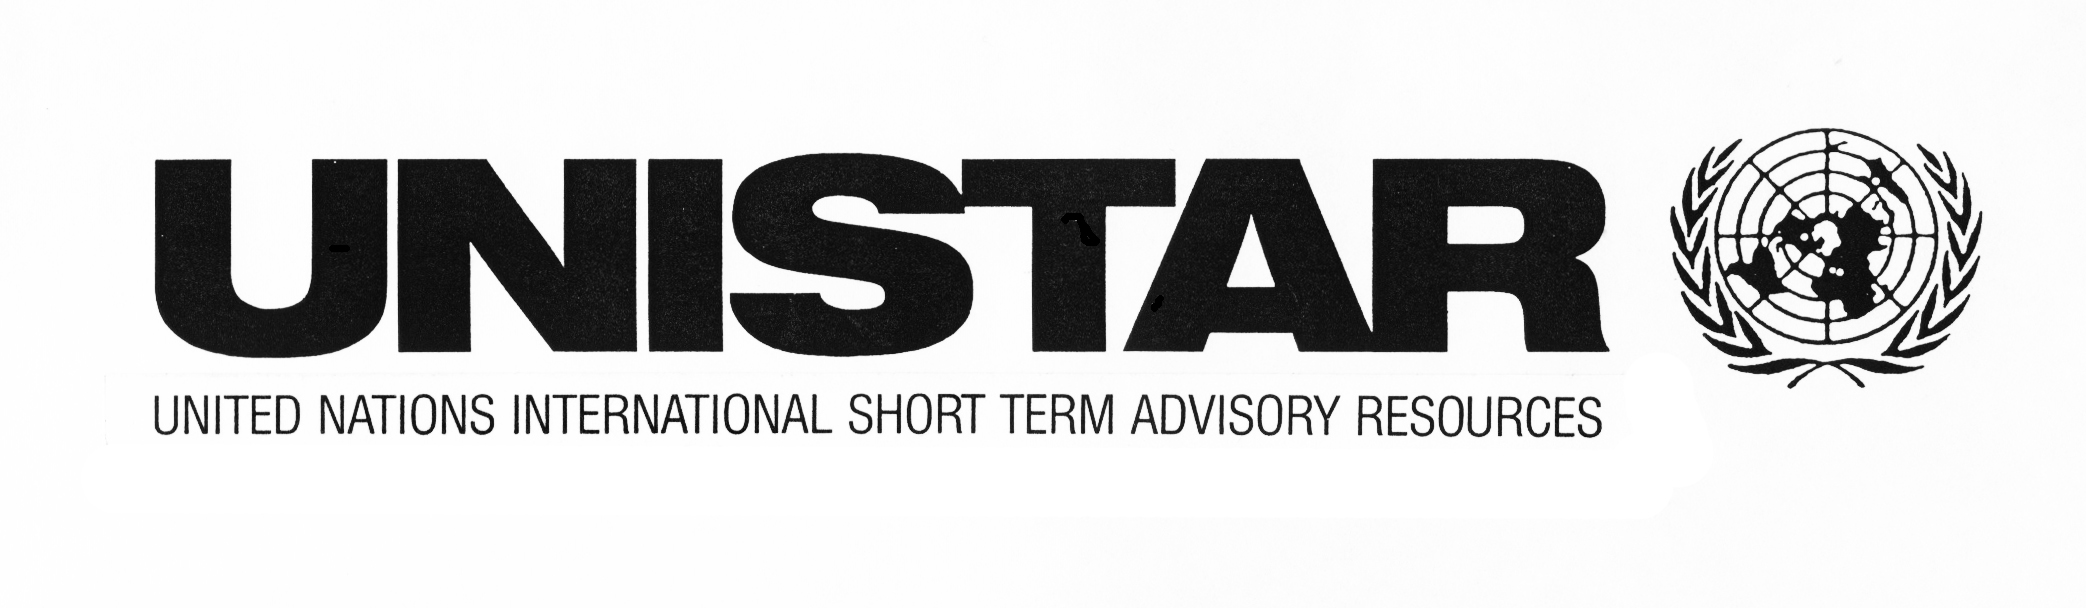 Unistar Logo.jpg